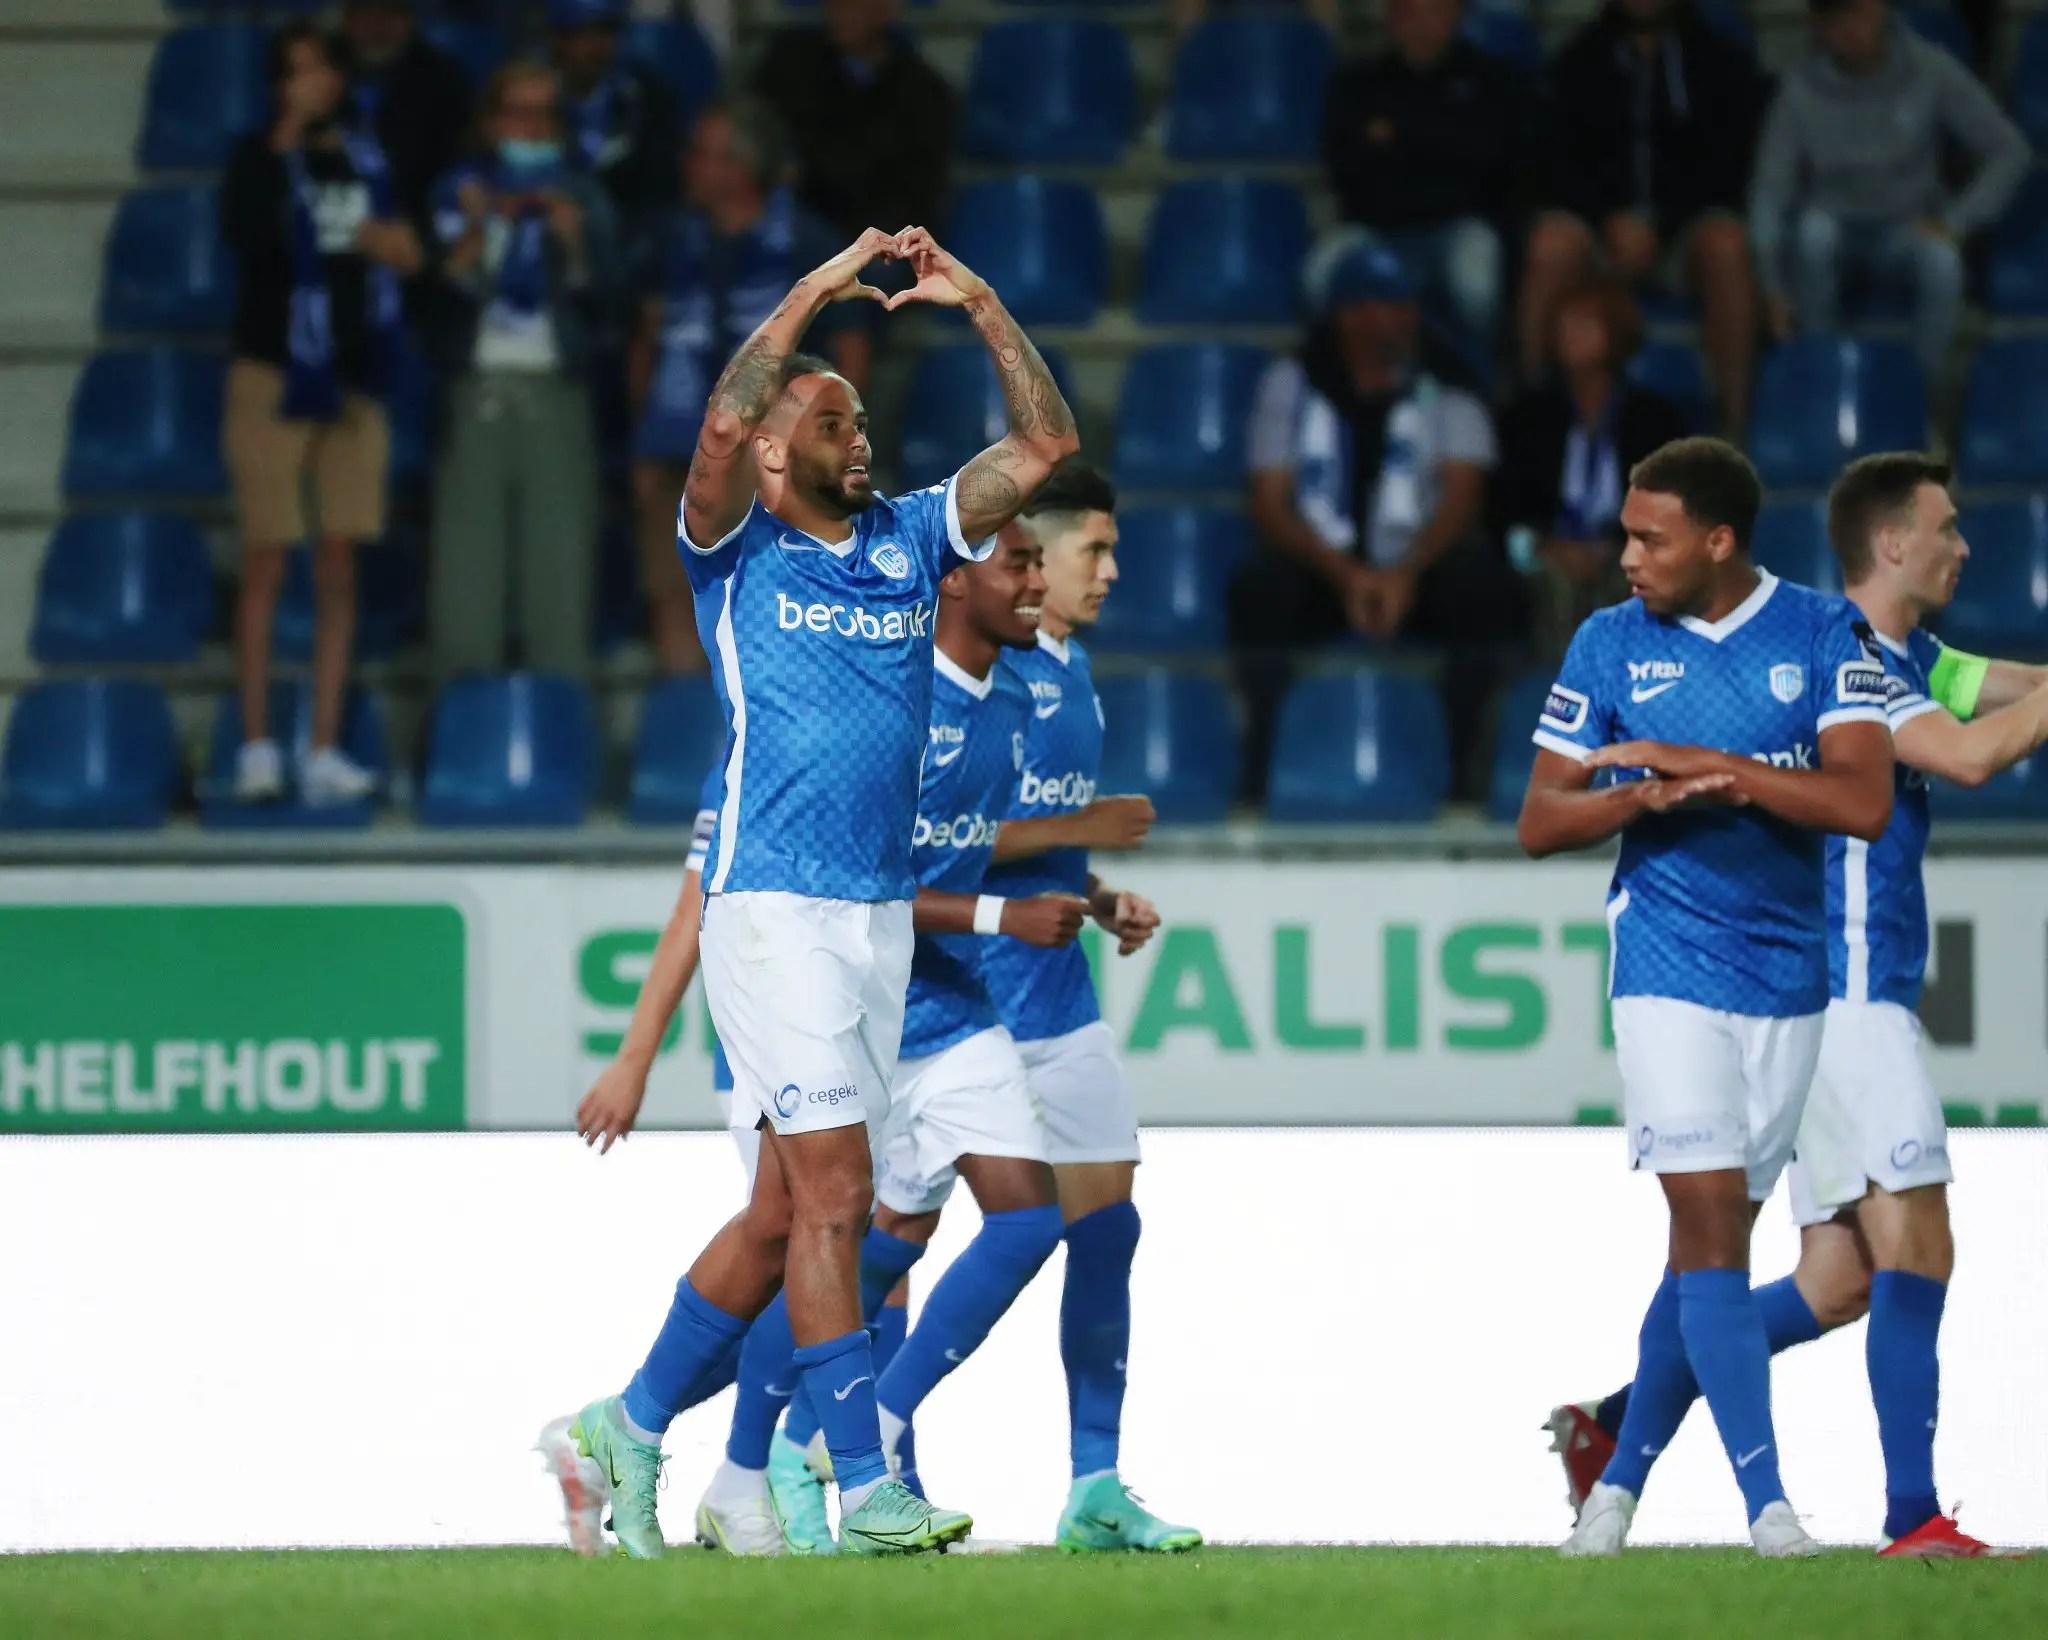 Belgian Jupiler: Dessers Bags Assist Again, Onuachu Not Listed As Genk Lose In Seven-Goal Thriller